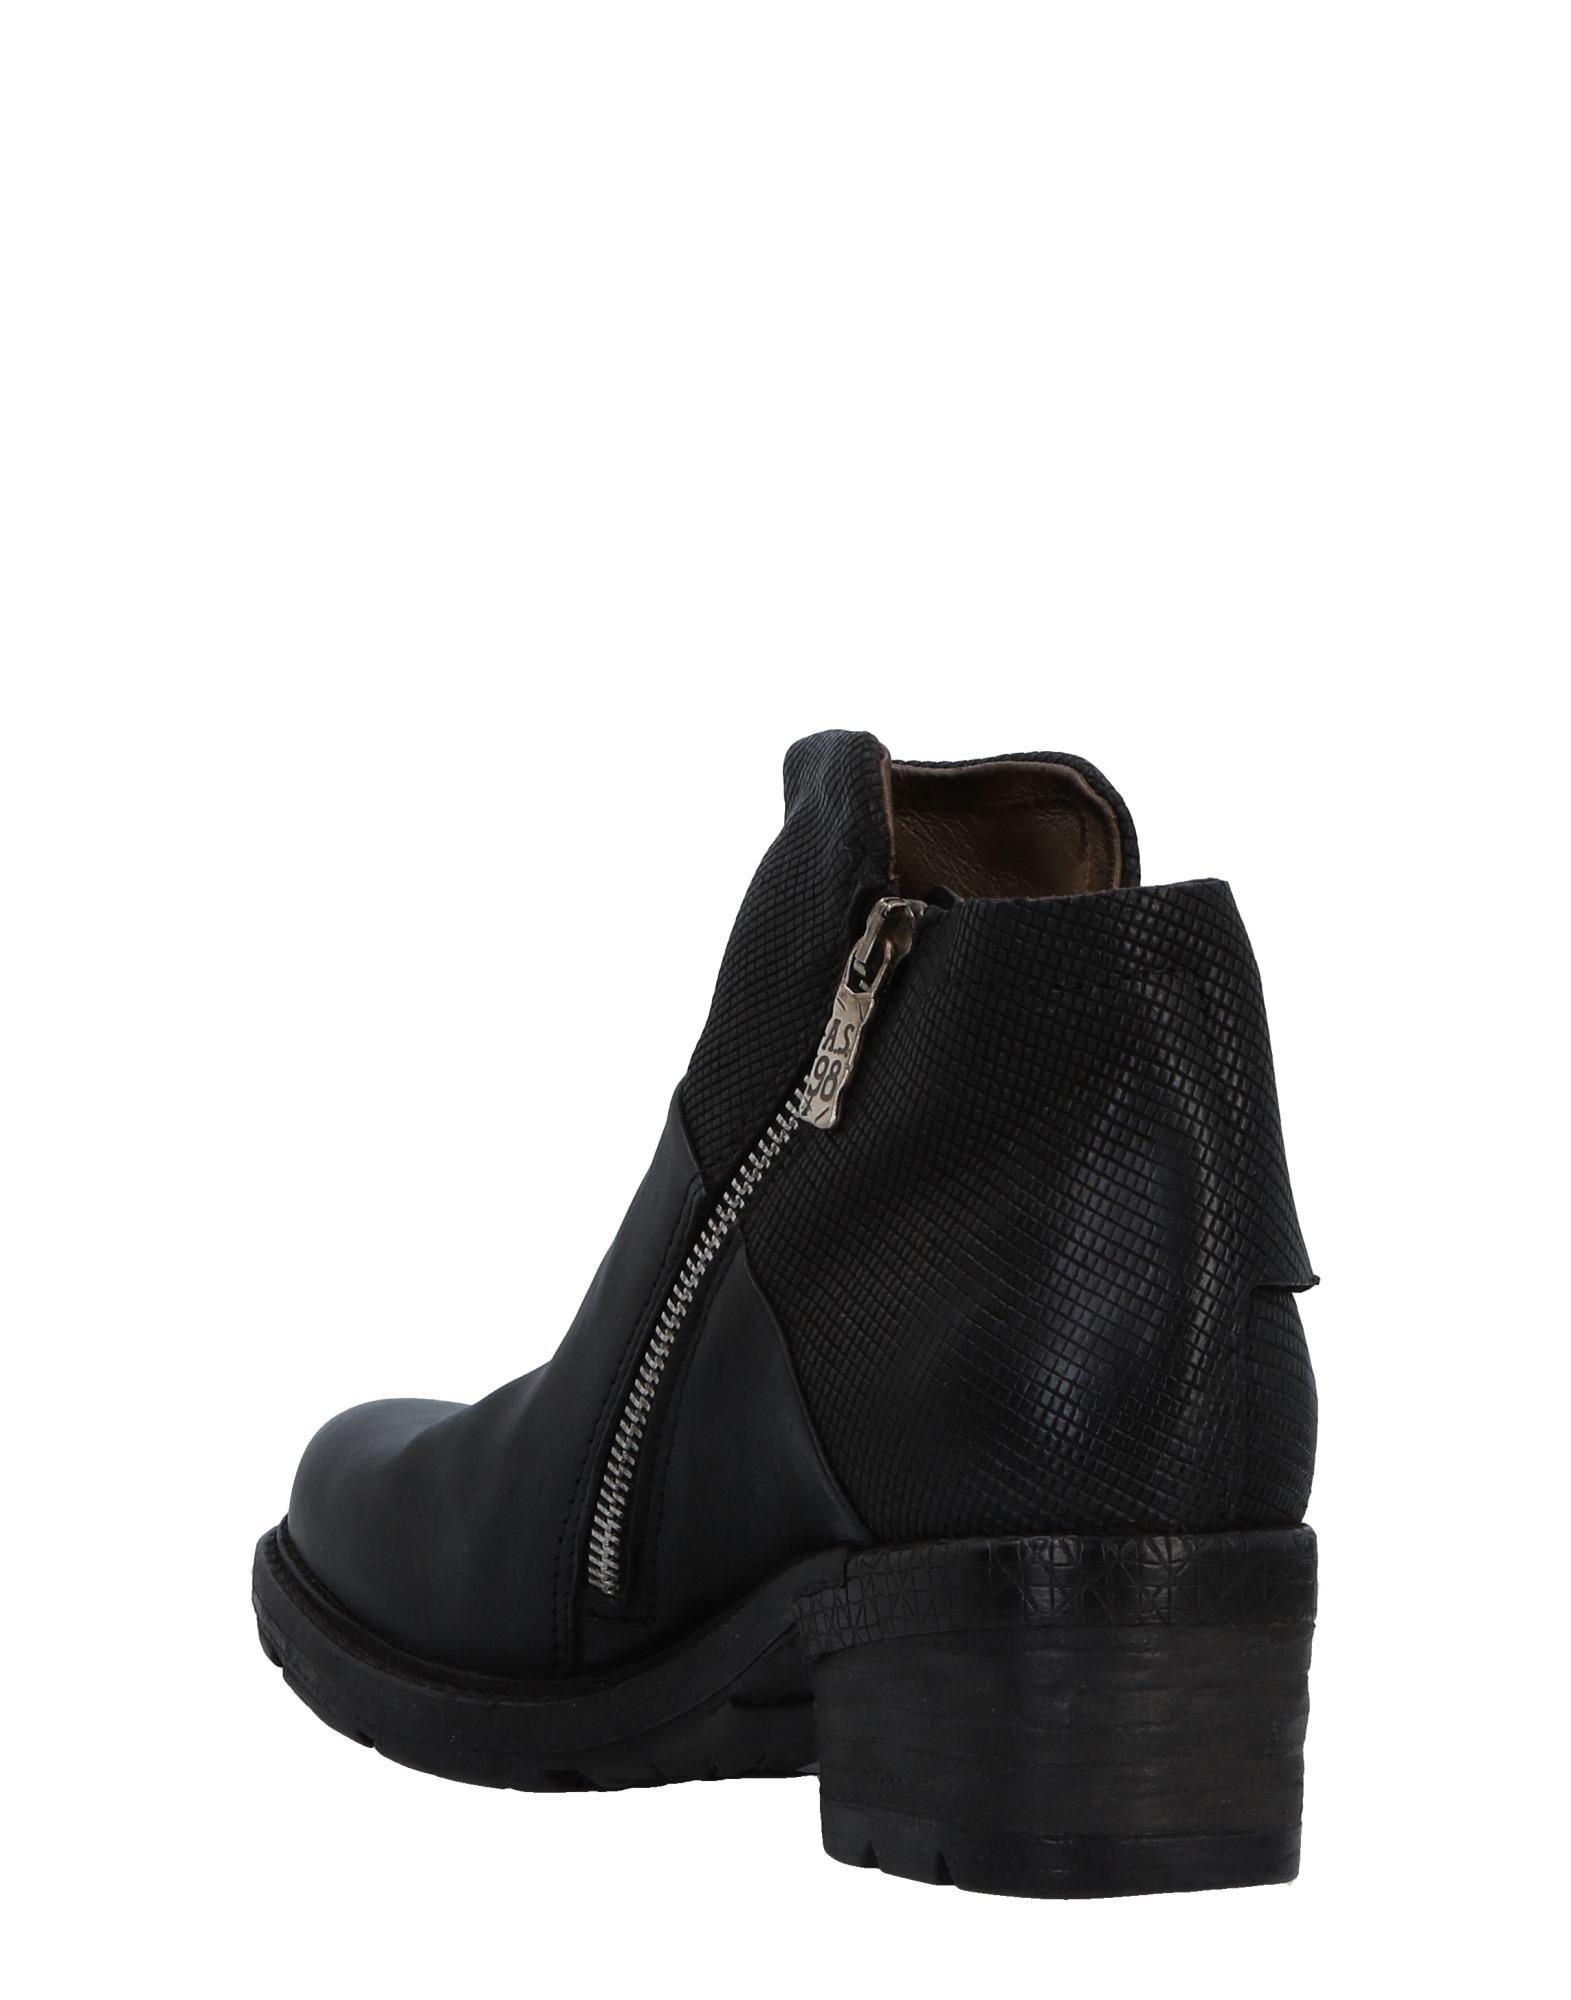 Stilvolle billige Schuhe A.S. 98 11512140PL Stiefelette Damen  11512140PL 98 d3c0b8